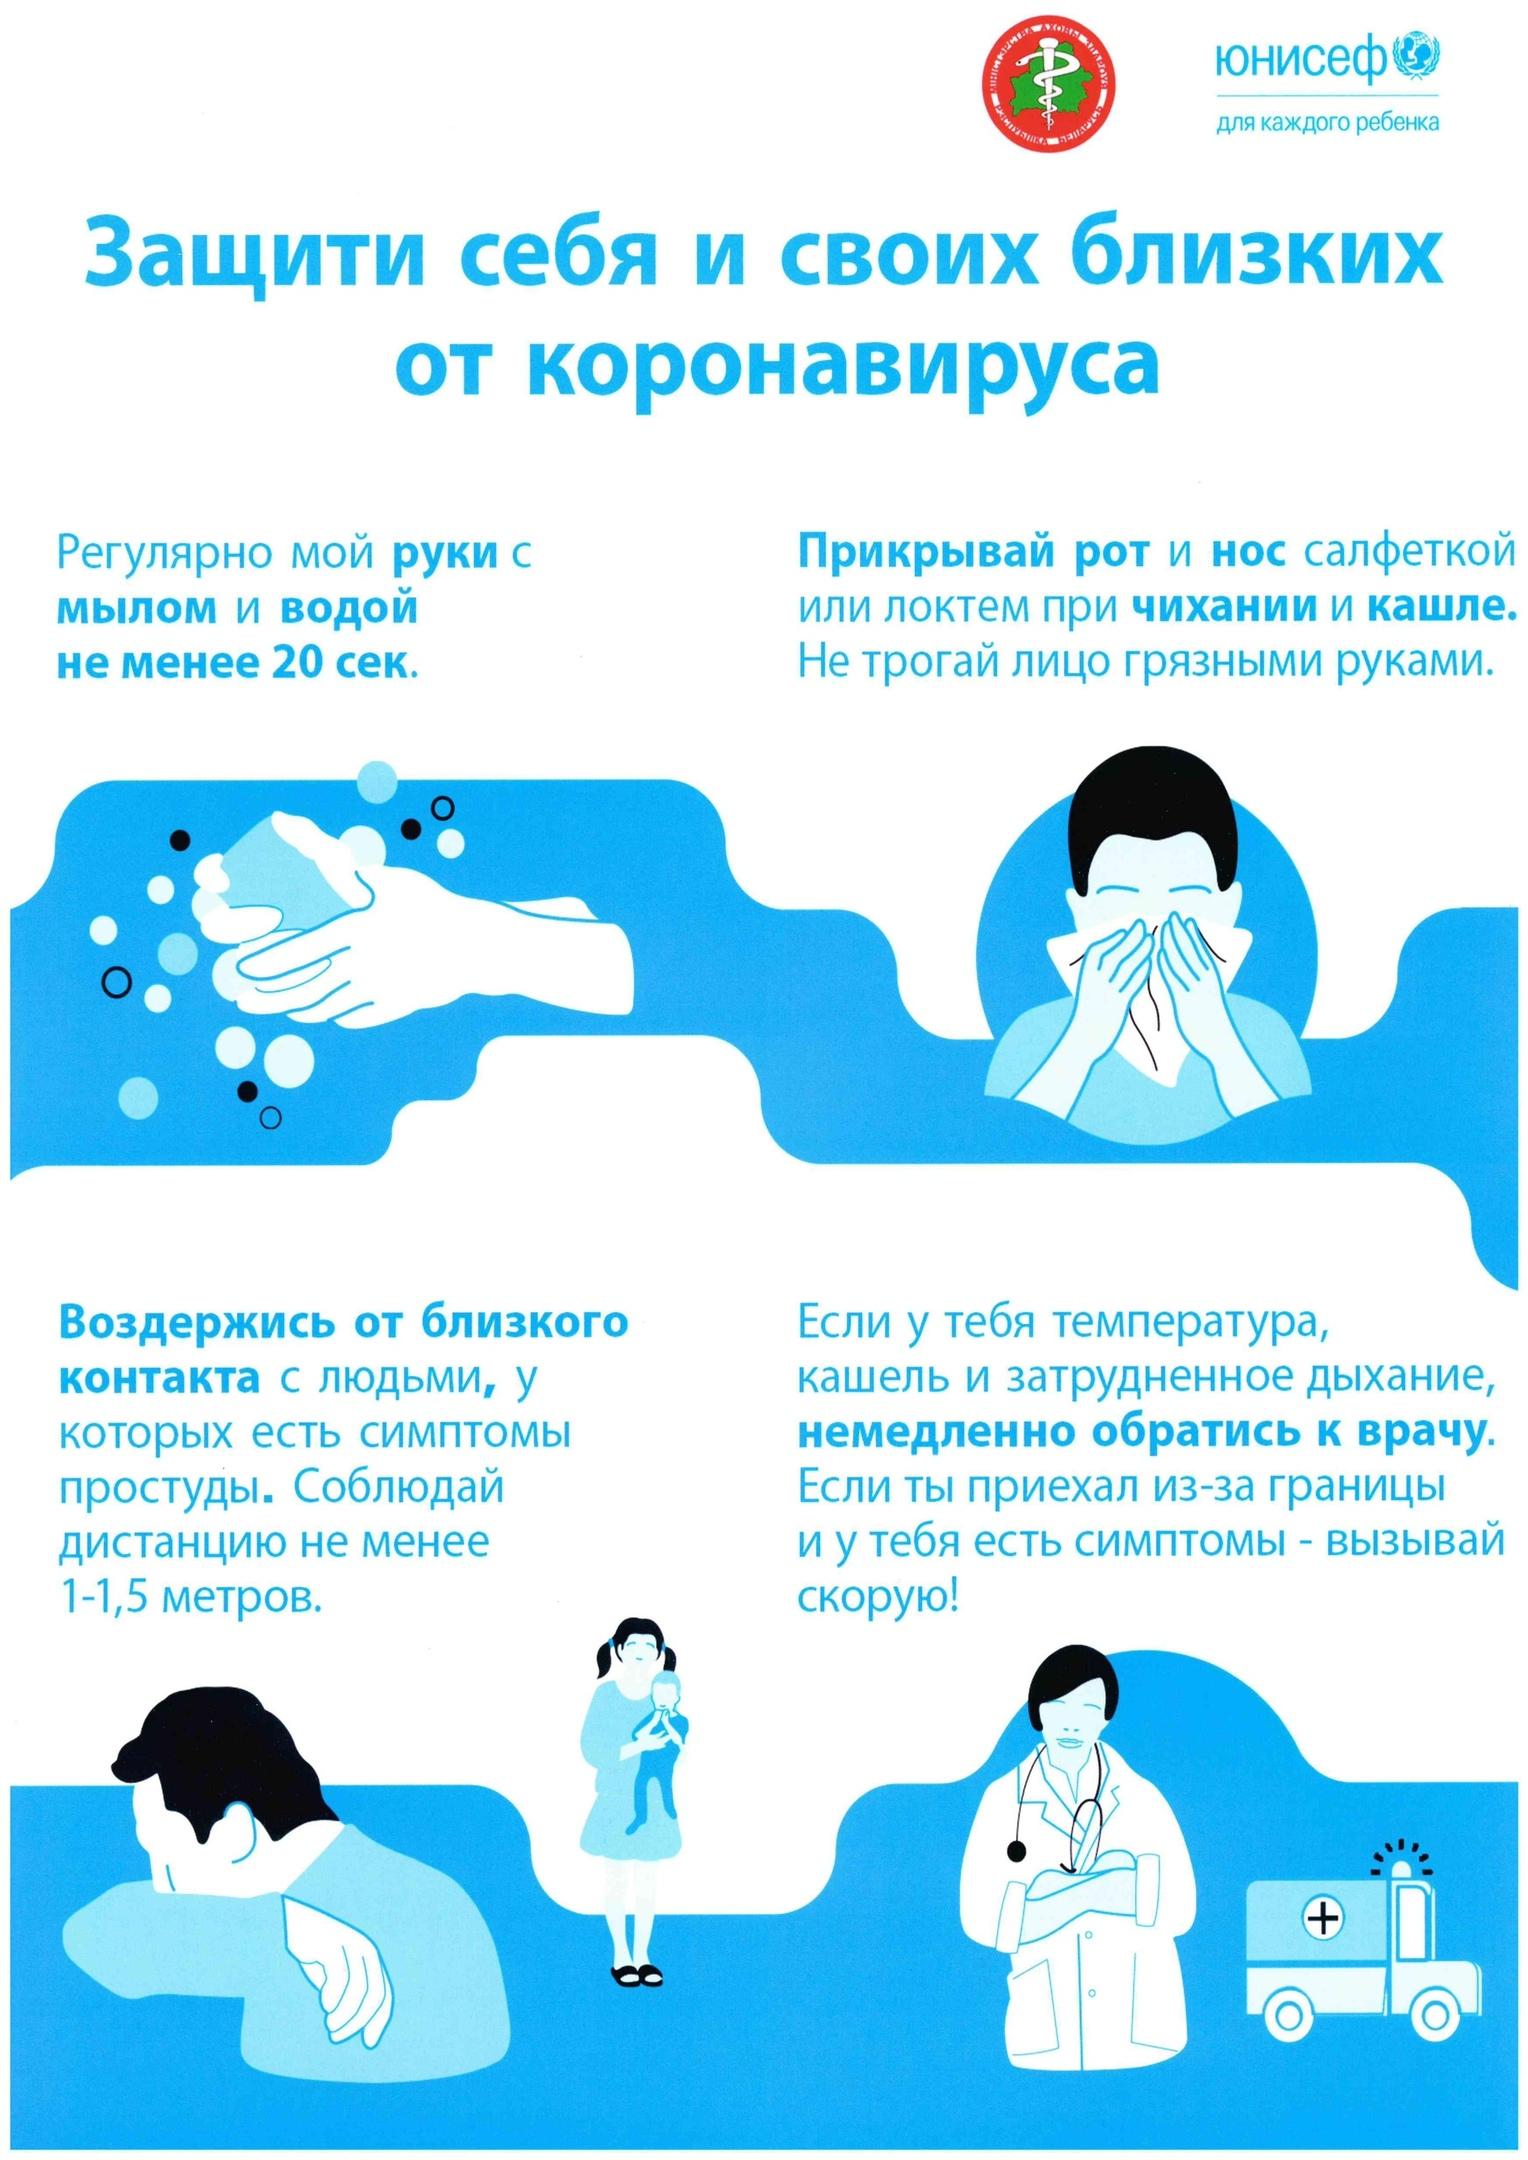 Защити себя и своих близких от коронавируса (+ВИДЕО)